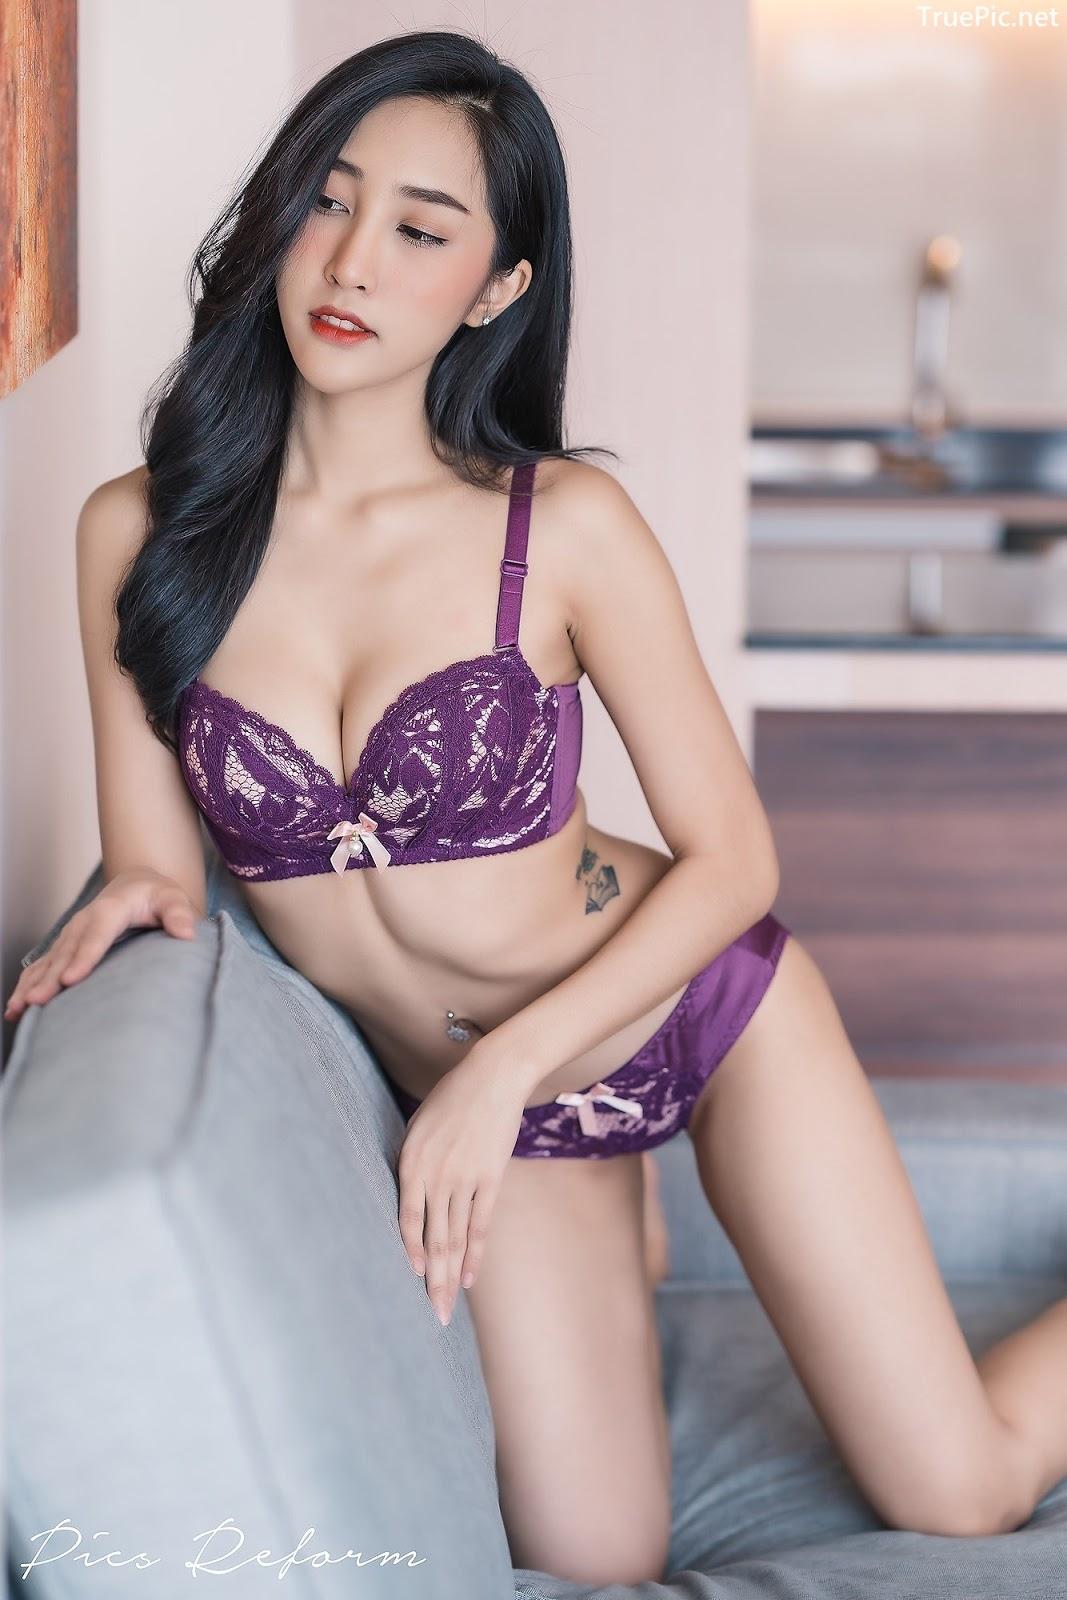 Image-Thailand-Sexy-Model-Yanapat-Ukkararujipat-Violet-Girl-TruePic.net- Picture-9